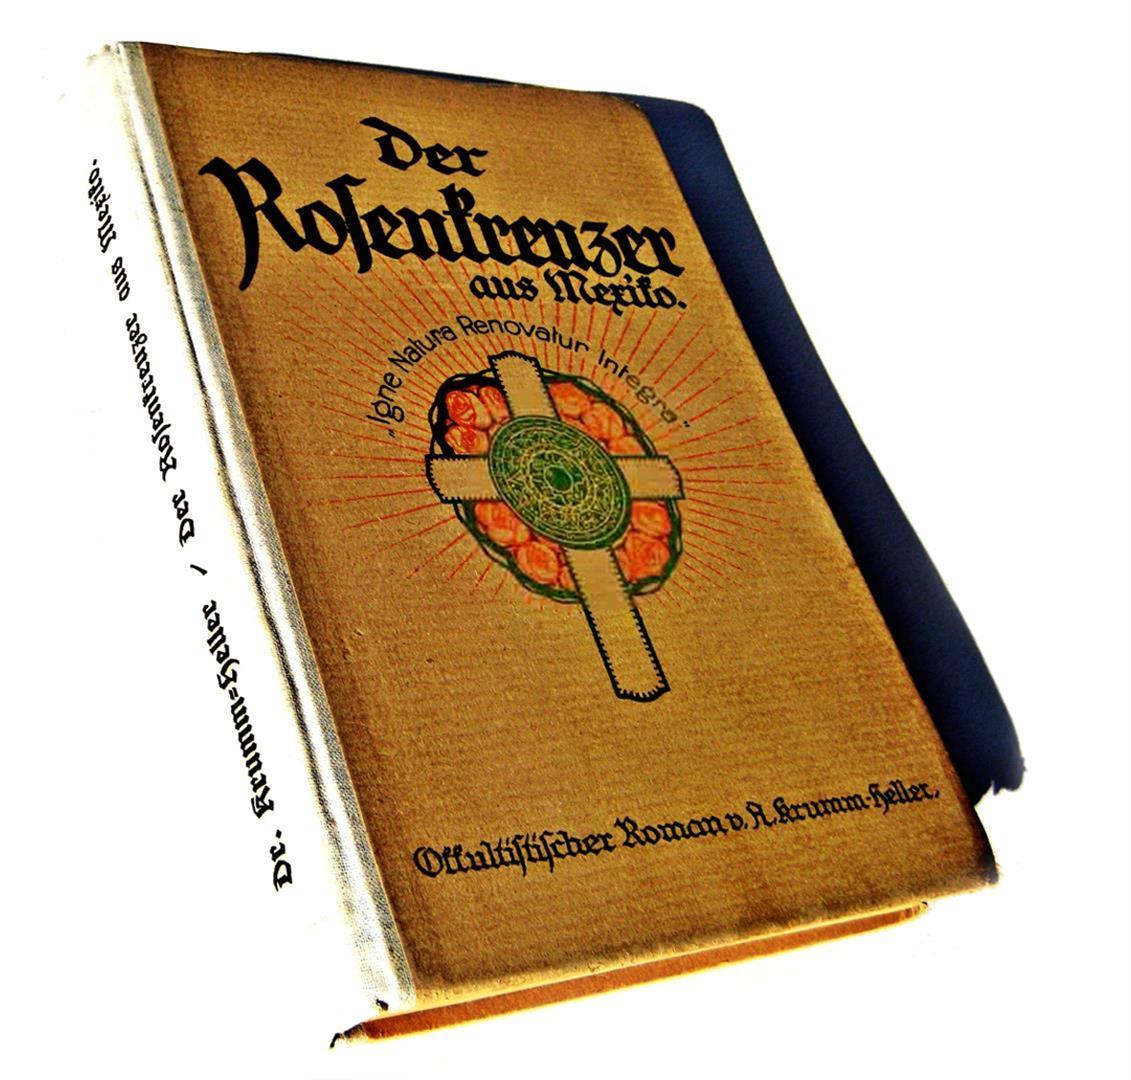 Fraternitas Rosicruciana Antiqua — Der Rosenkreuzer aus Mexiko — Arnoldo Krumm-Heller — Frater Huiracocha